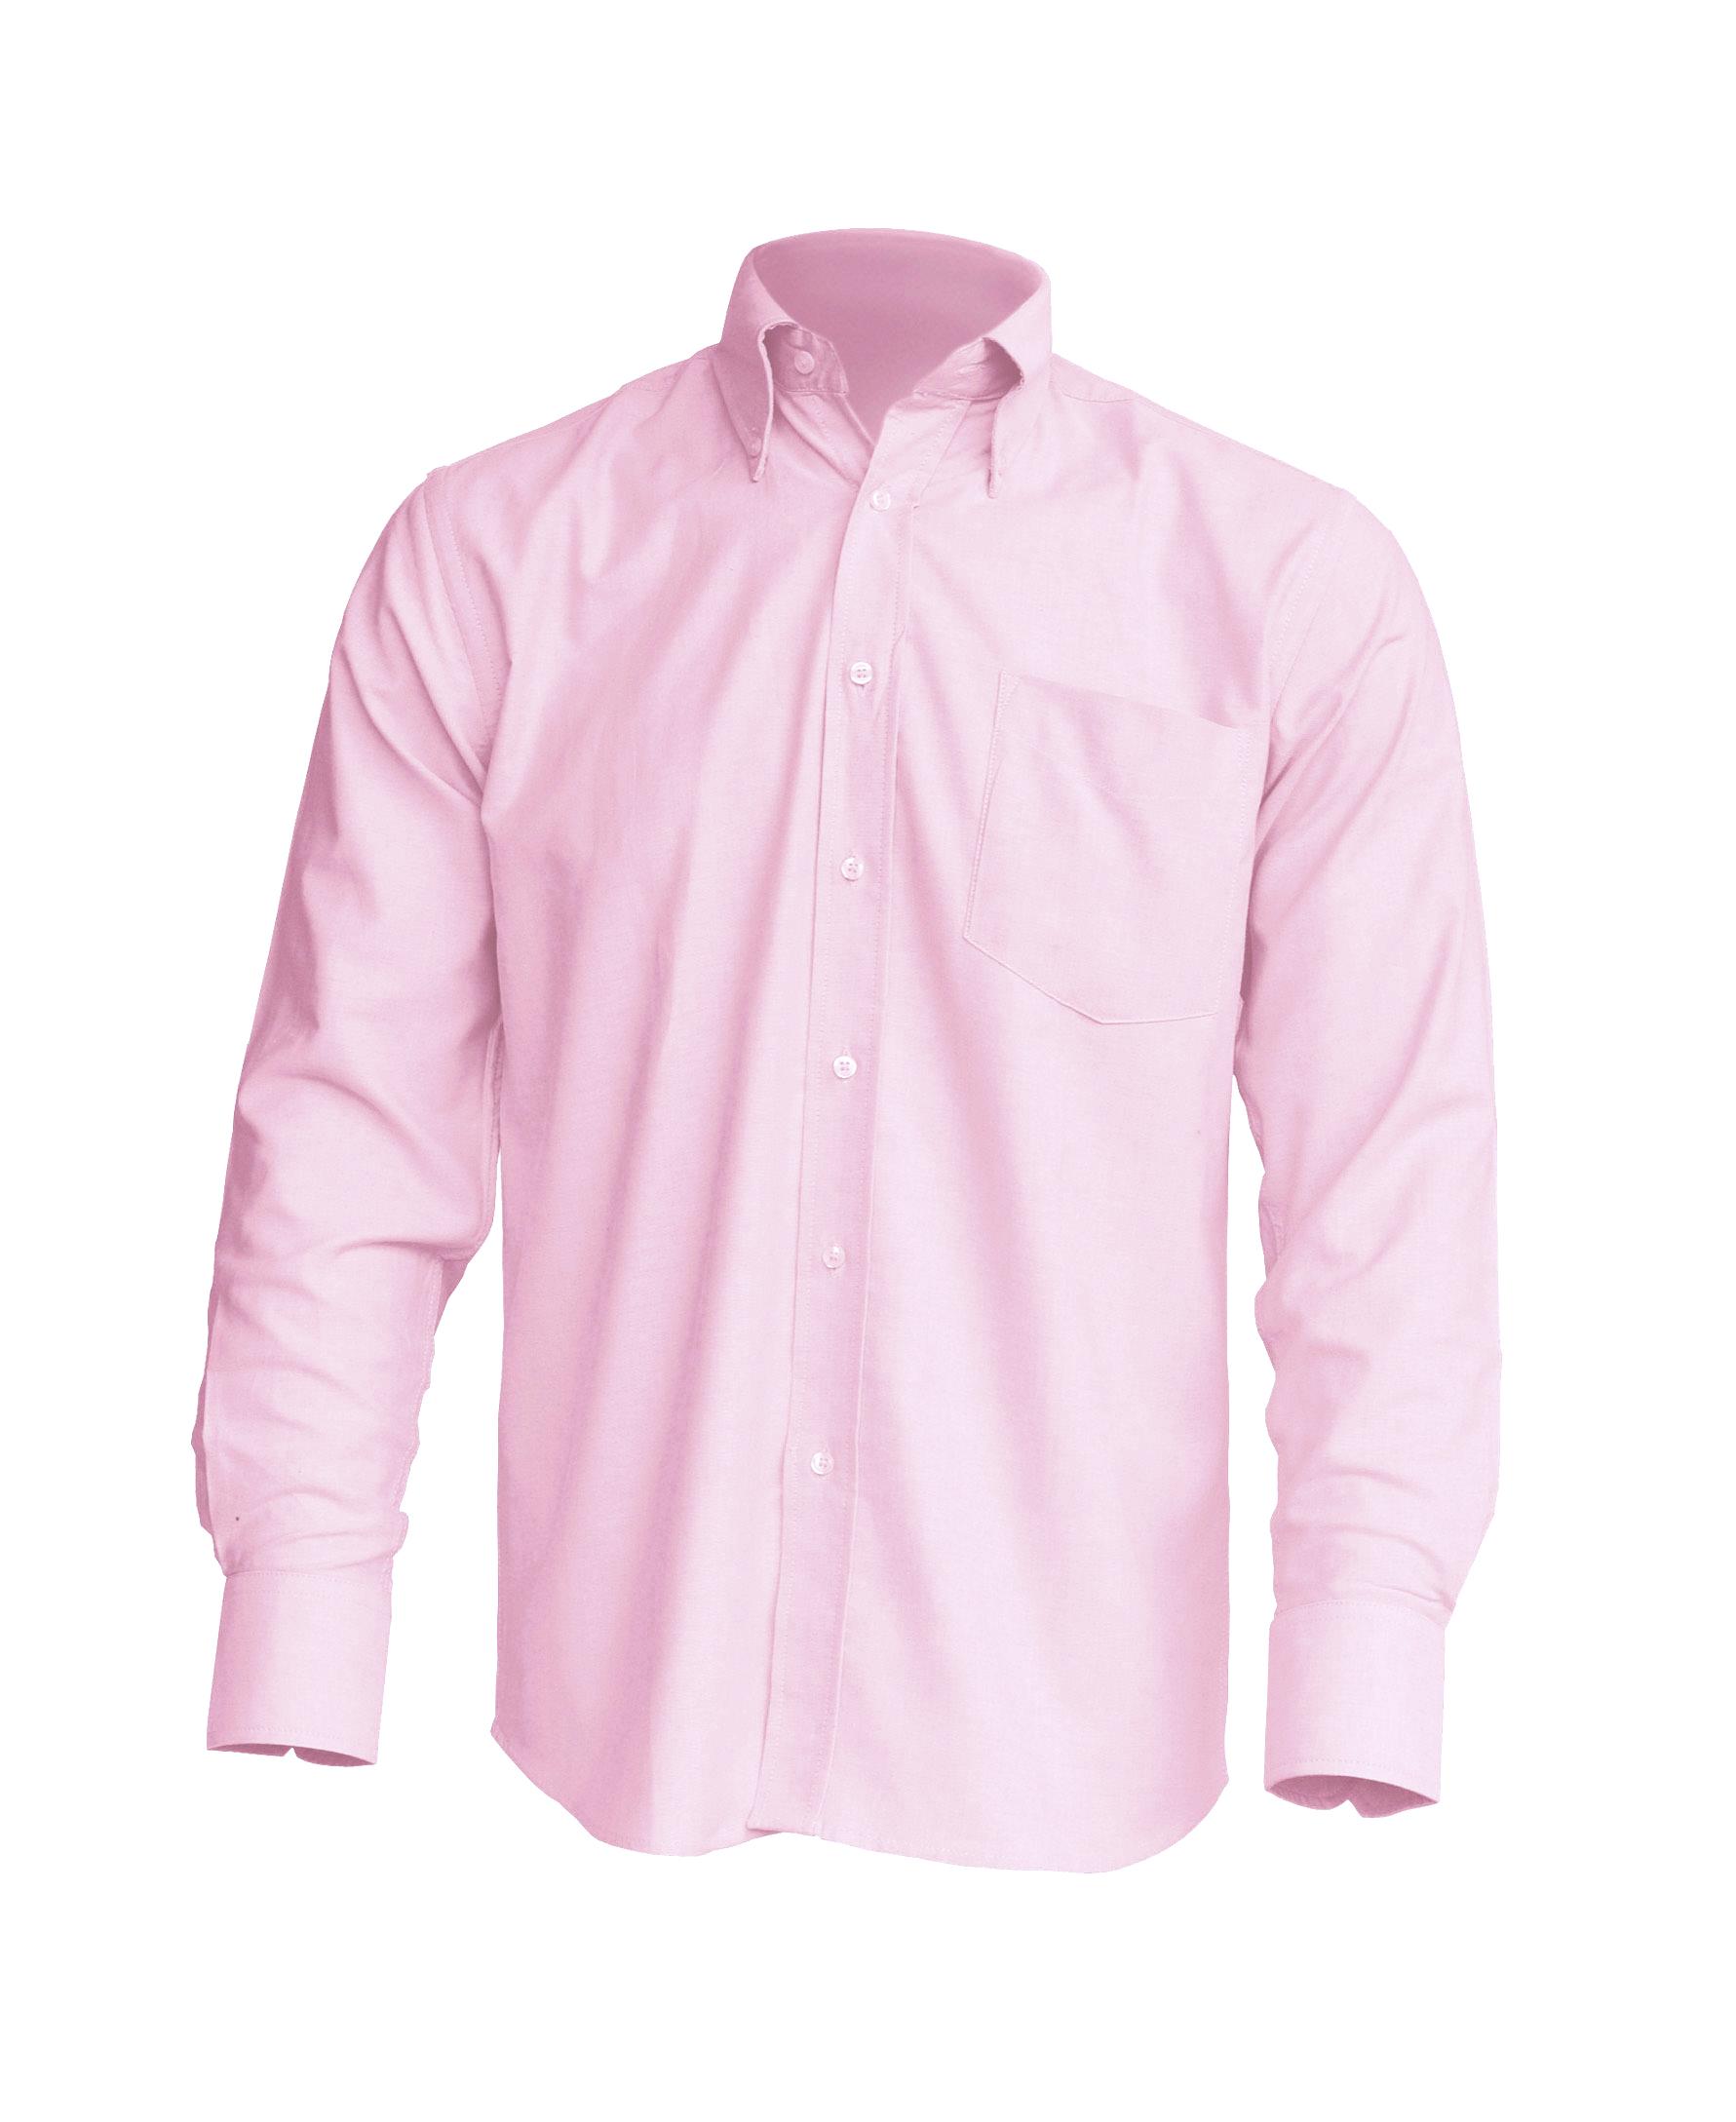 Shirt Oxford Pink